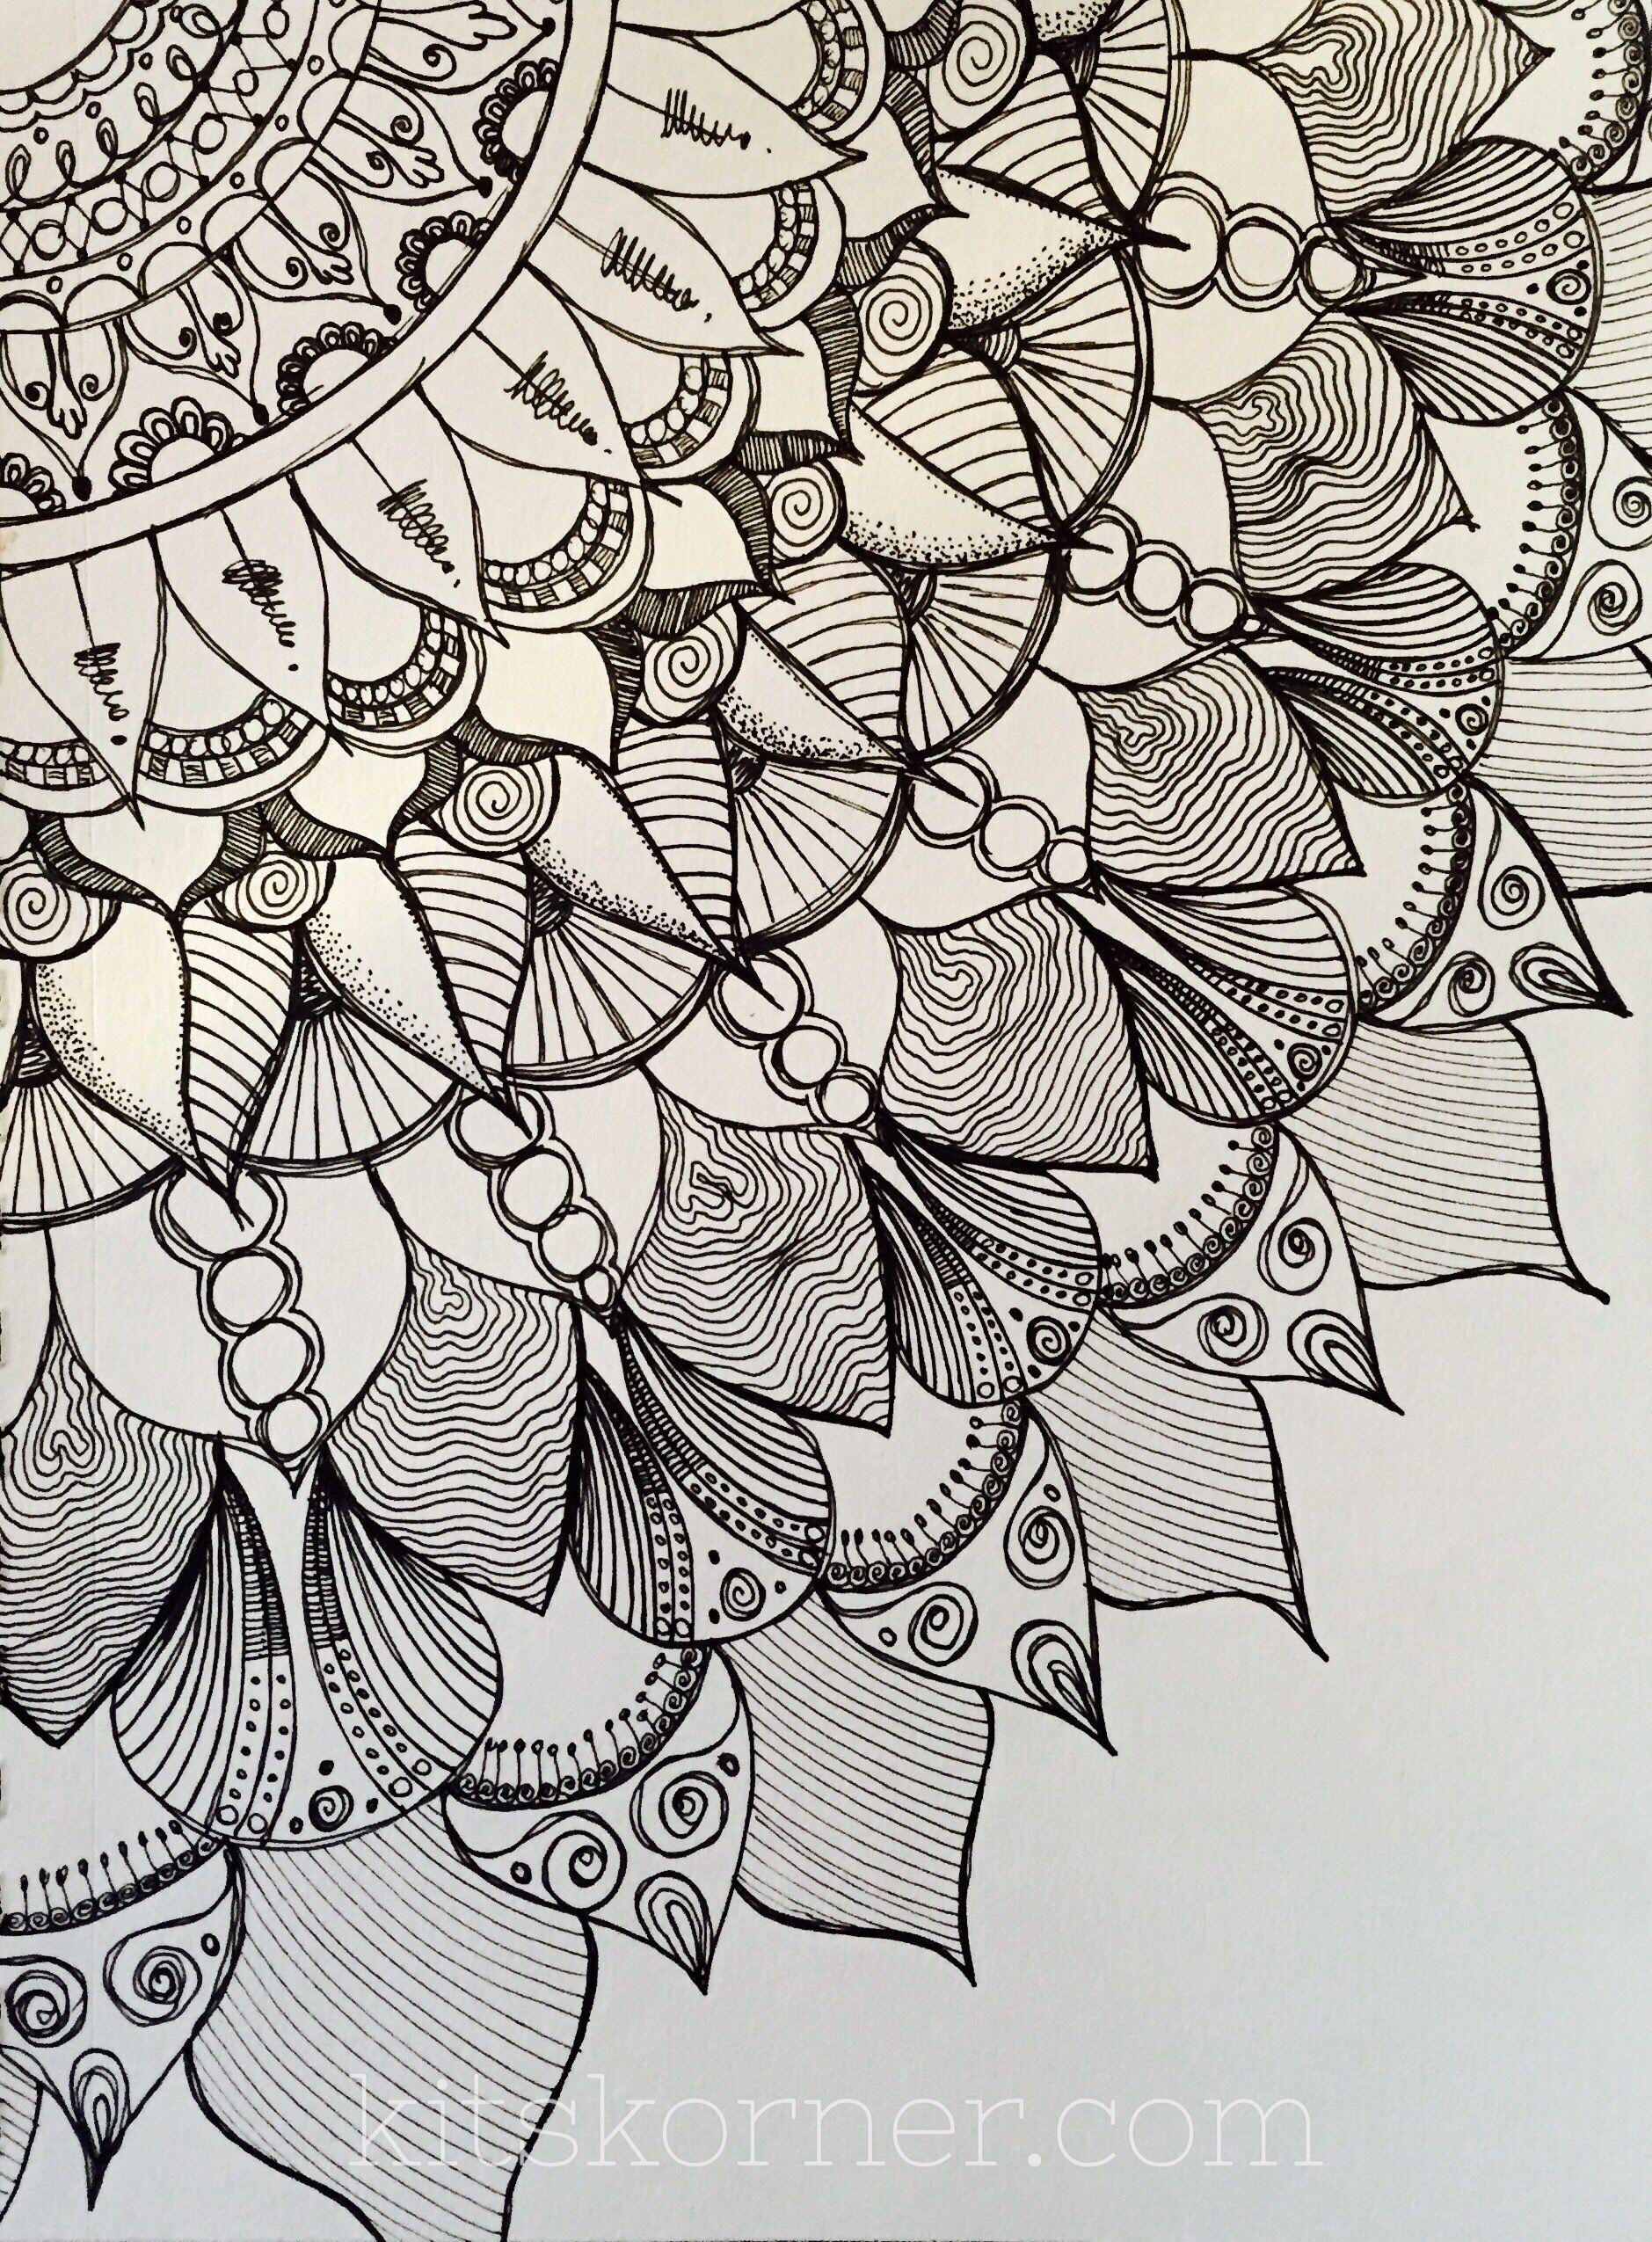 Color art mandala wonders - My Sketchbook Mandalas 9 Pages Kitskorner Com